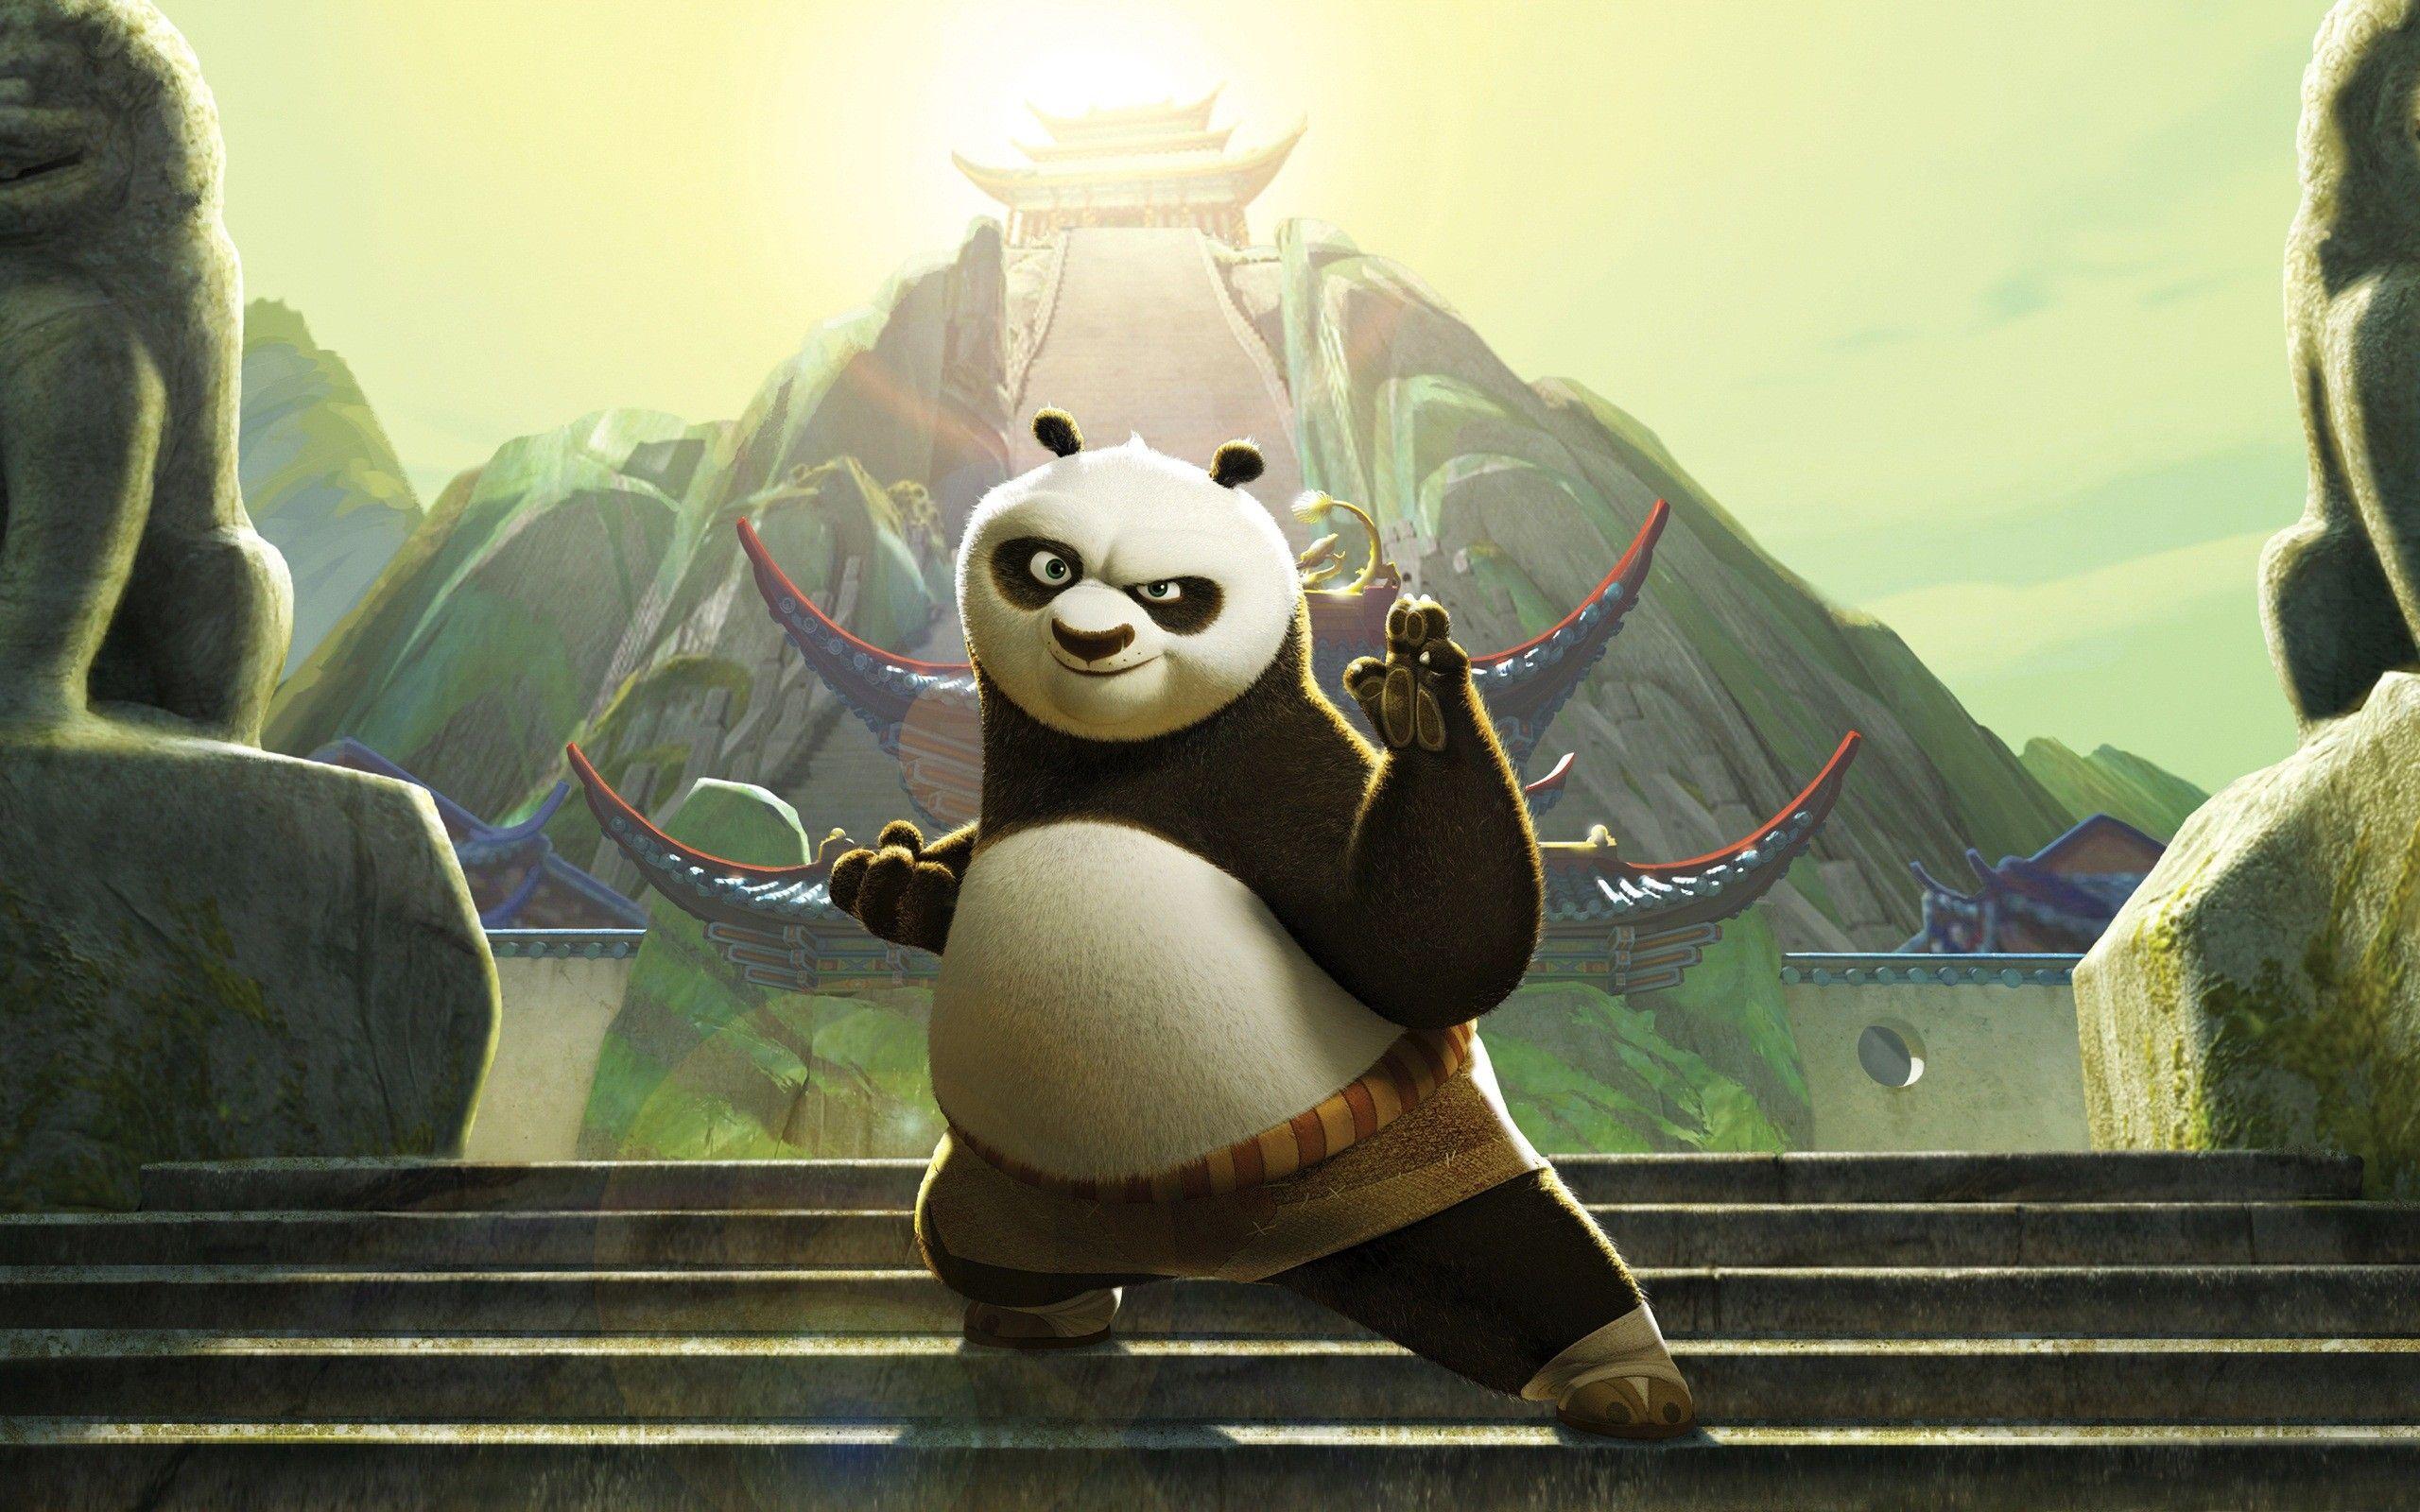 Animated Animal Hd Wallpapers Panda Wallpapers Kung Fu Panda